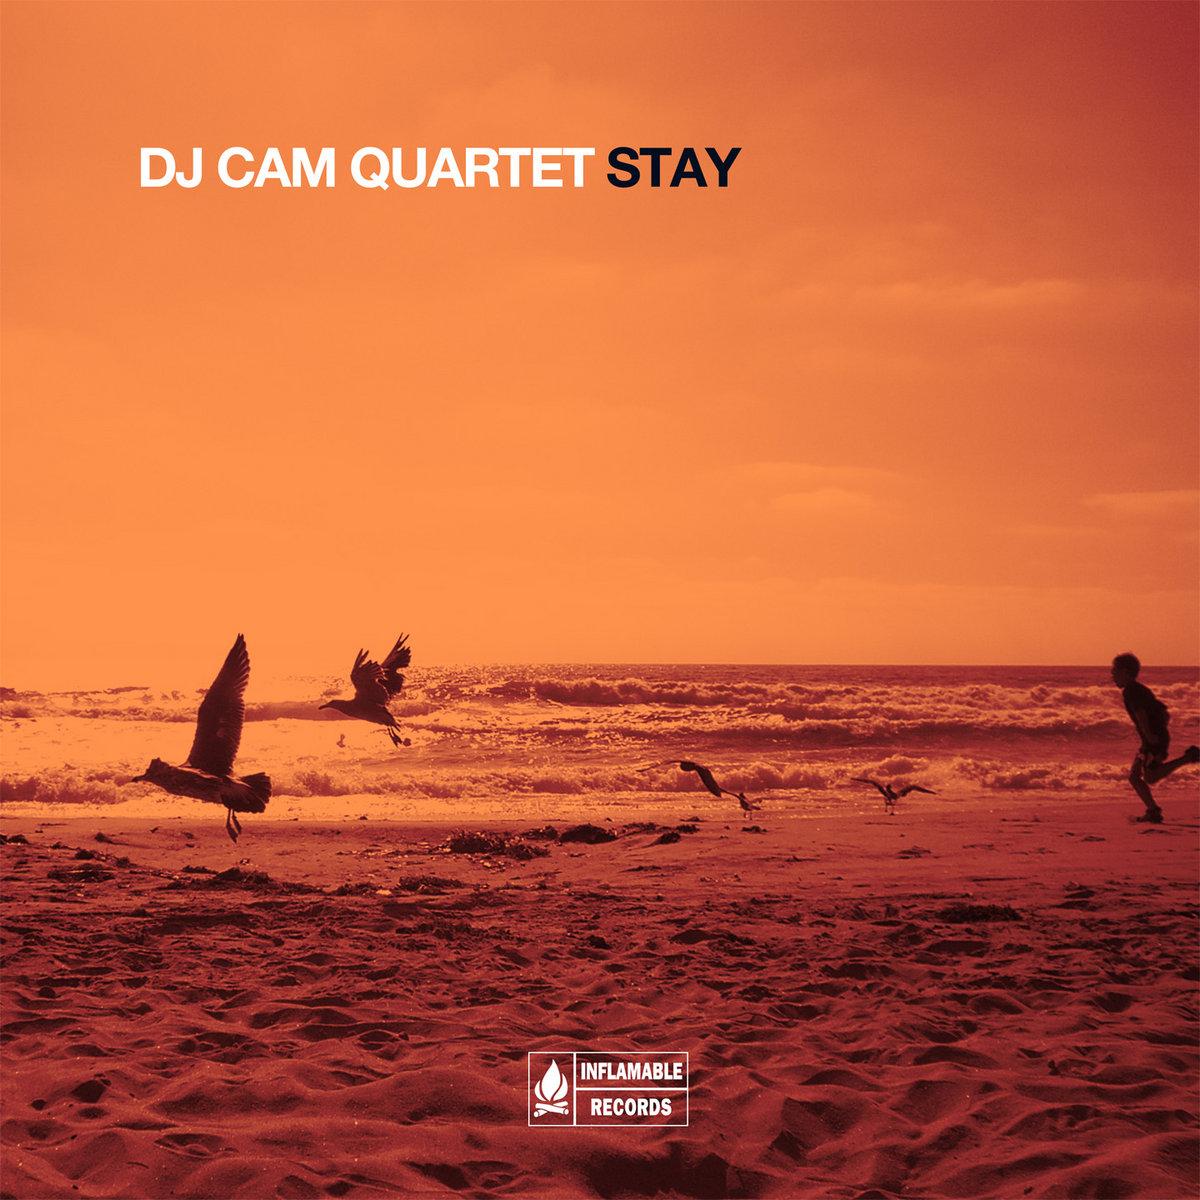 Everybody loves the sunshine ft. Inlove by dj cam & dj cam quartet.